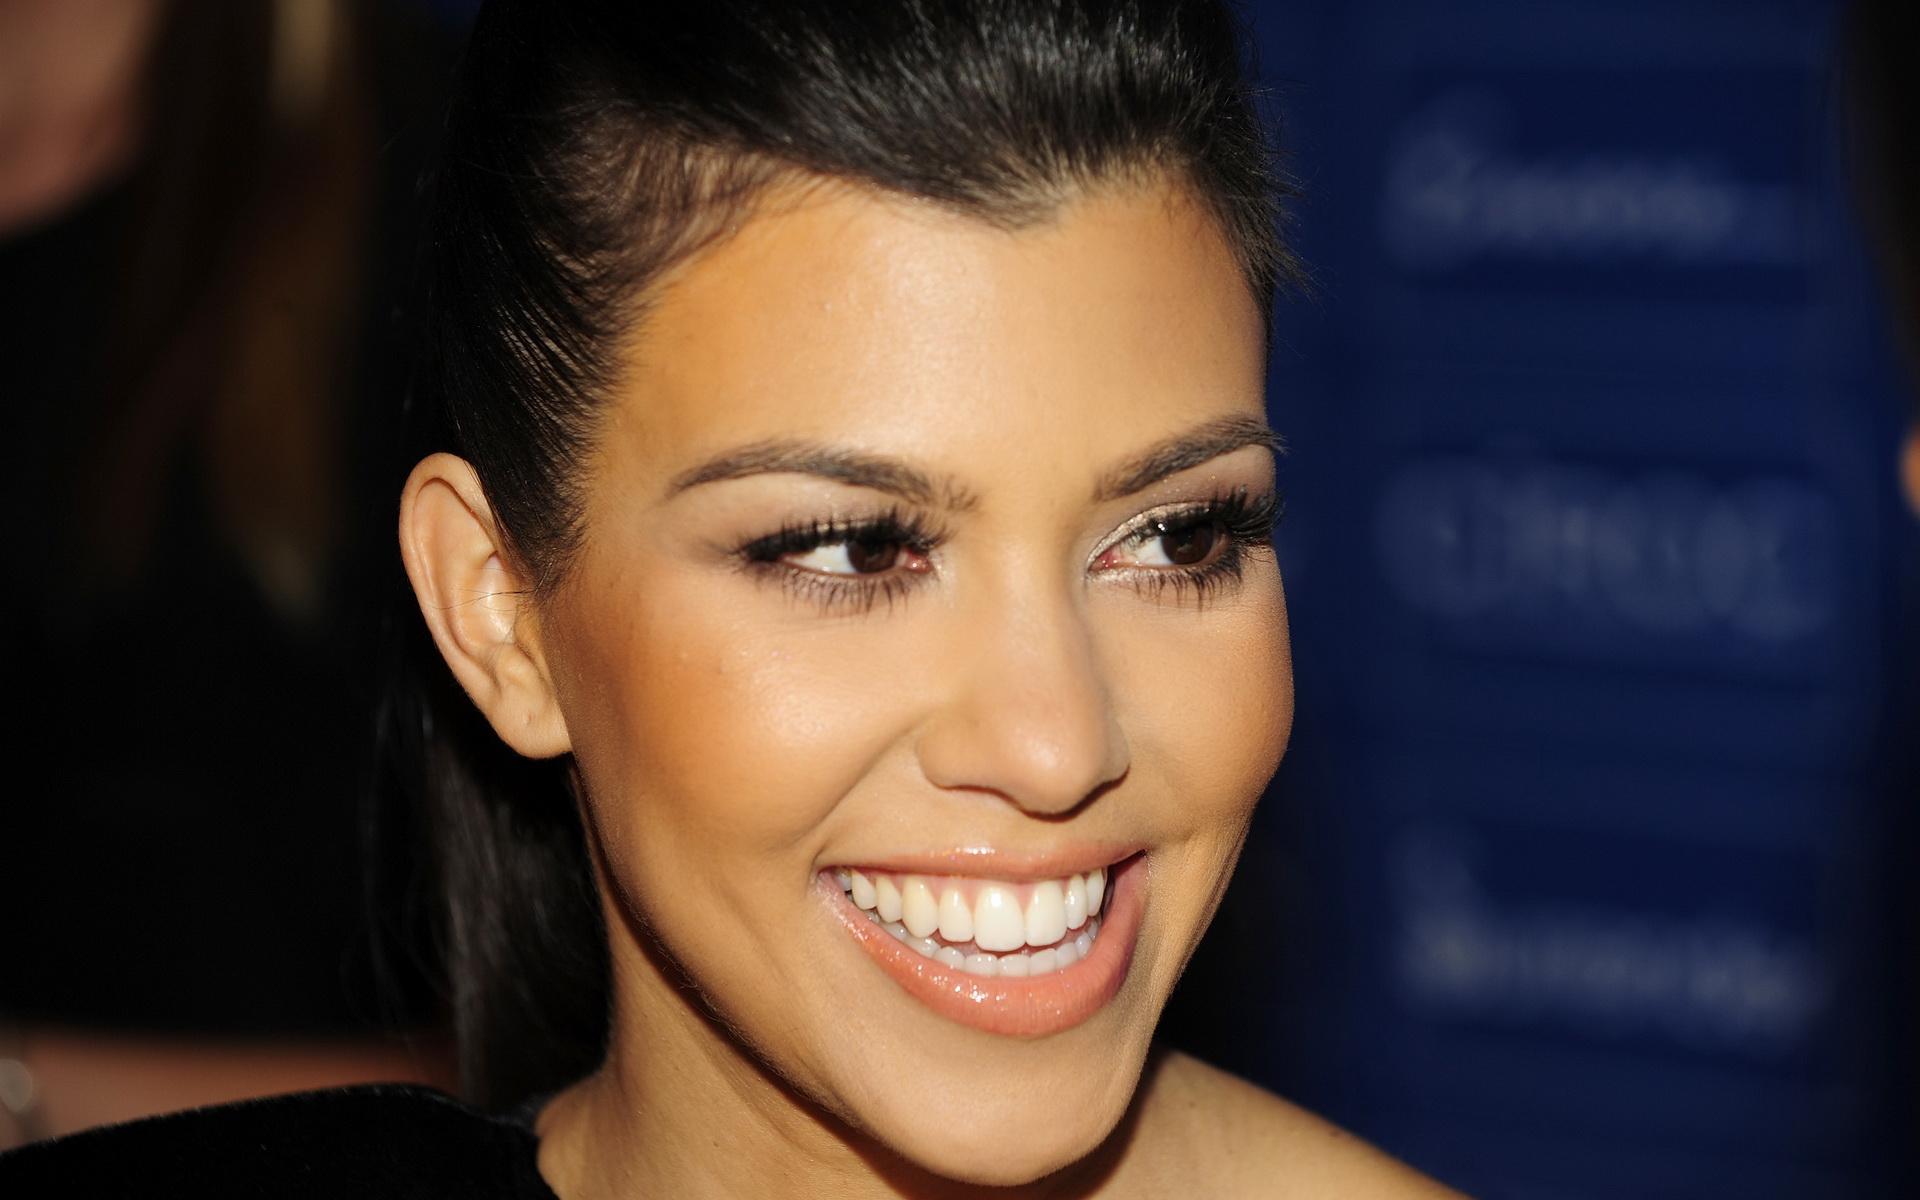 Kim Kardashian Wallpapers High Resolution: Kourtney Kardashian Full Hd Wallpaper Free Art Wallpapers 1920x1200px